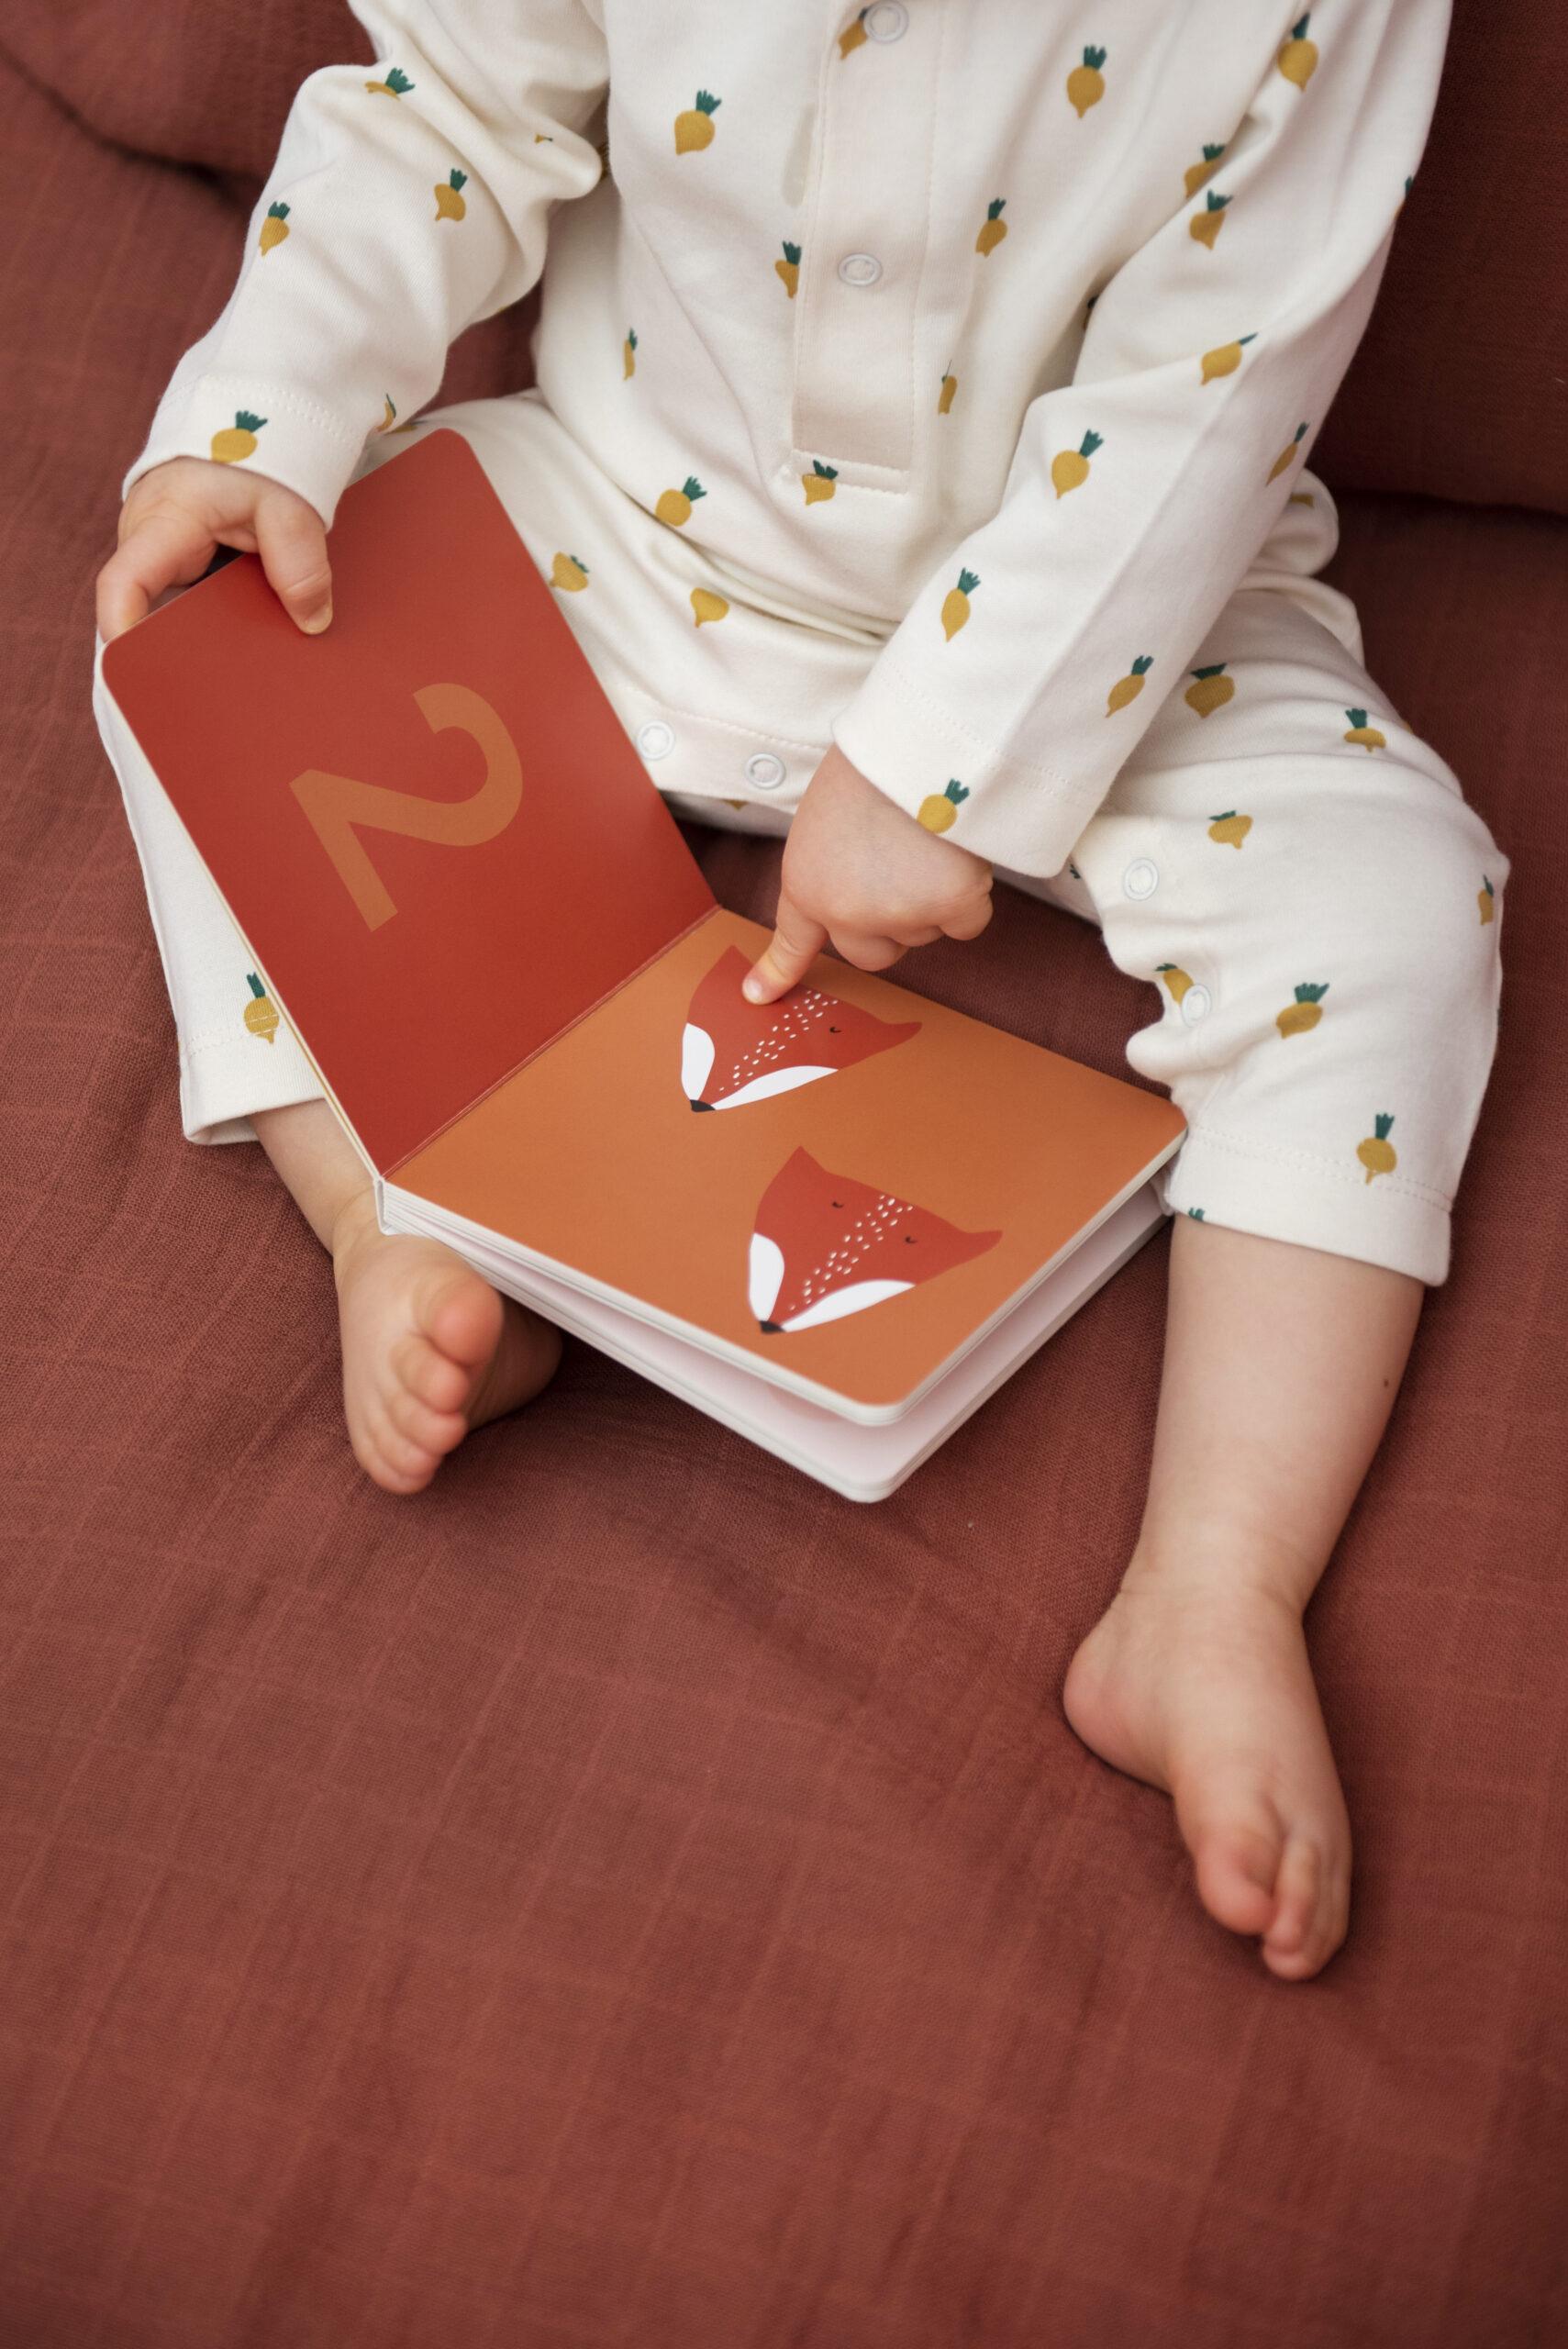 Afbeelding Trixie baby telboek